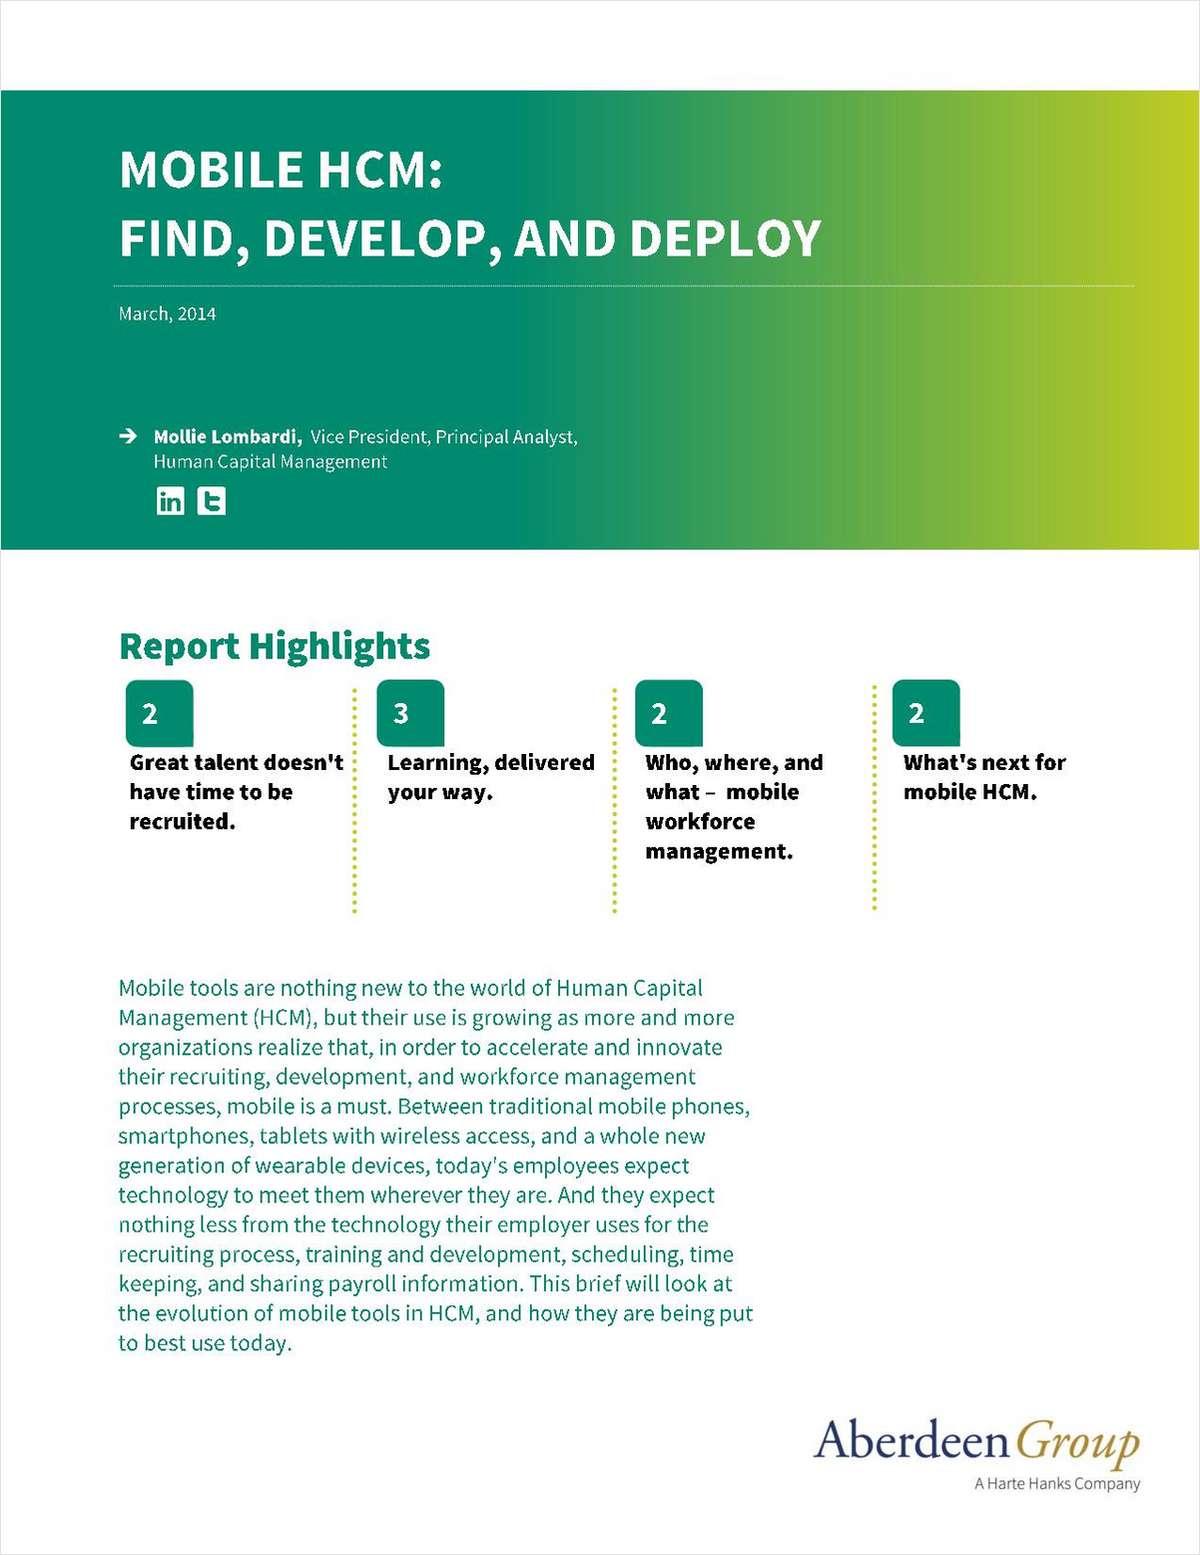 Mobile HCM: Find, Develop, and Deploy